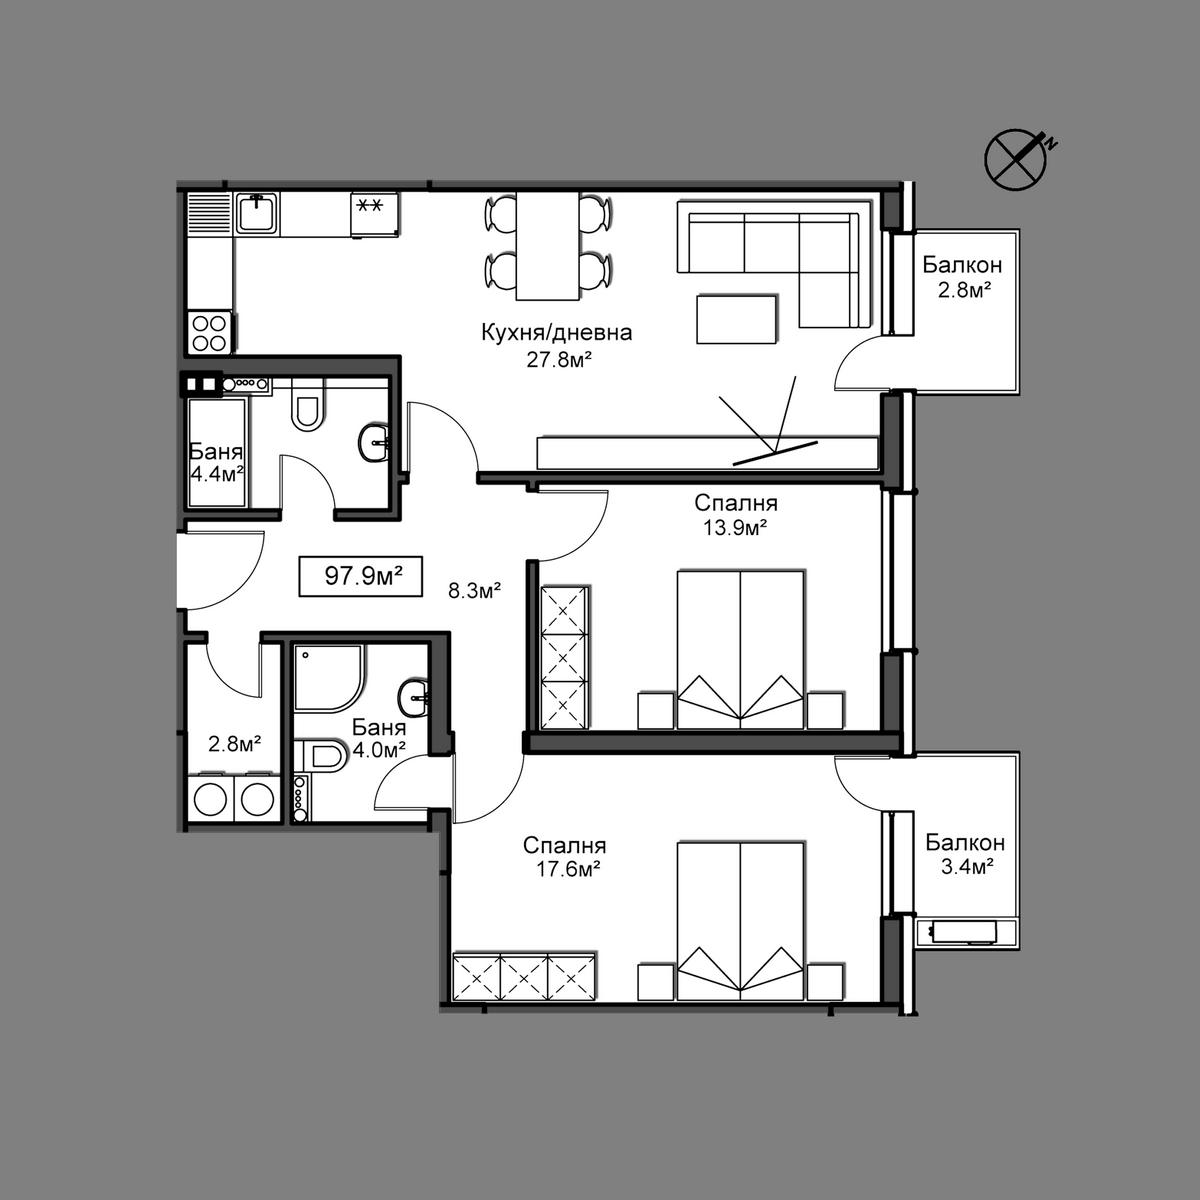 Продава апартамент ново строителство - Апартамент 27